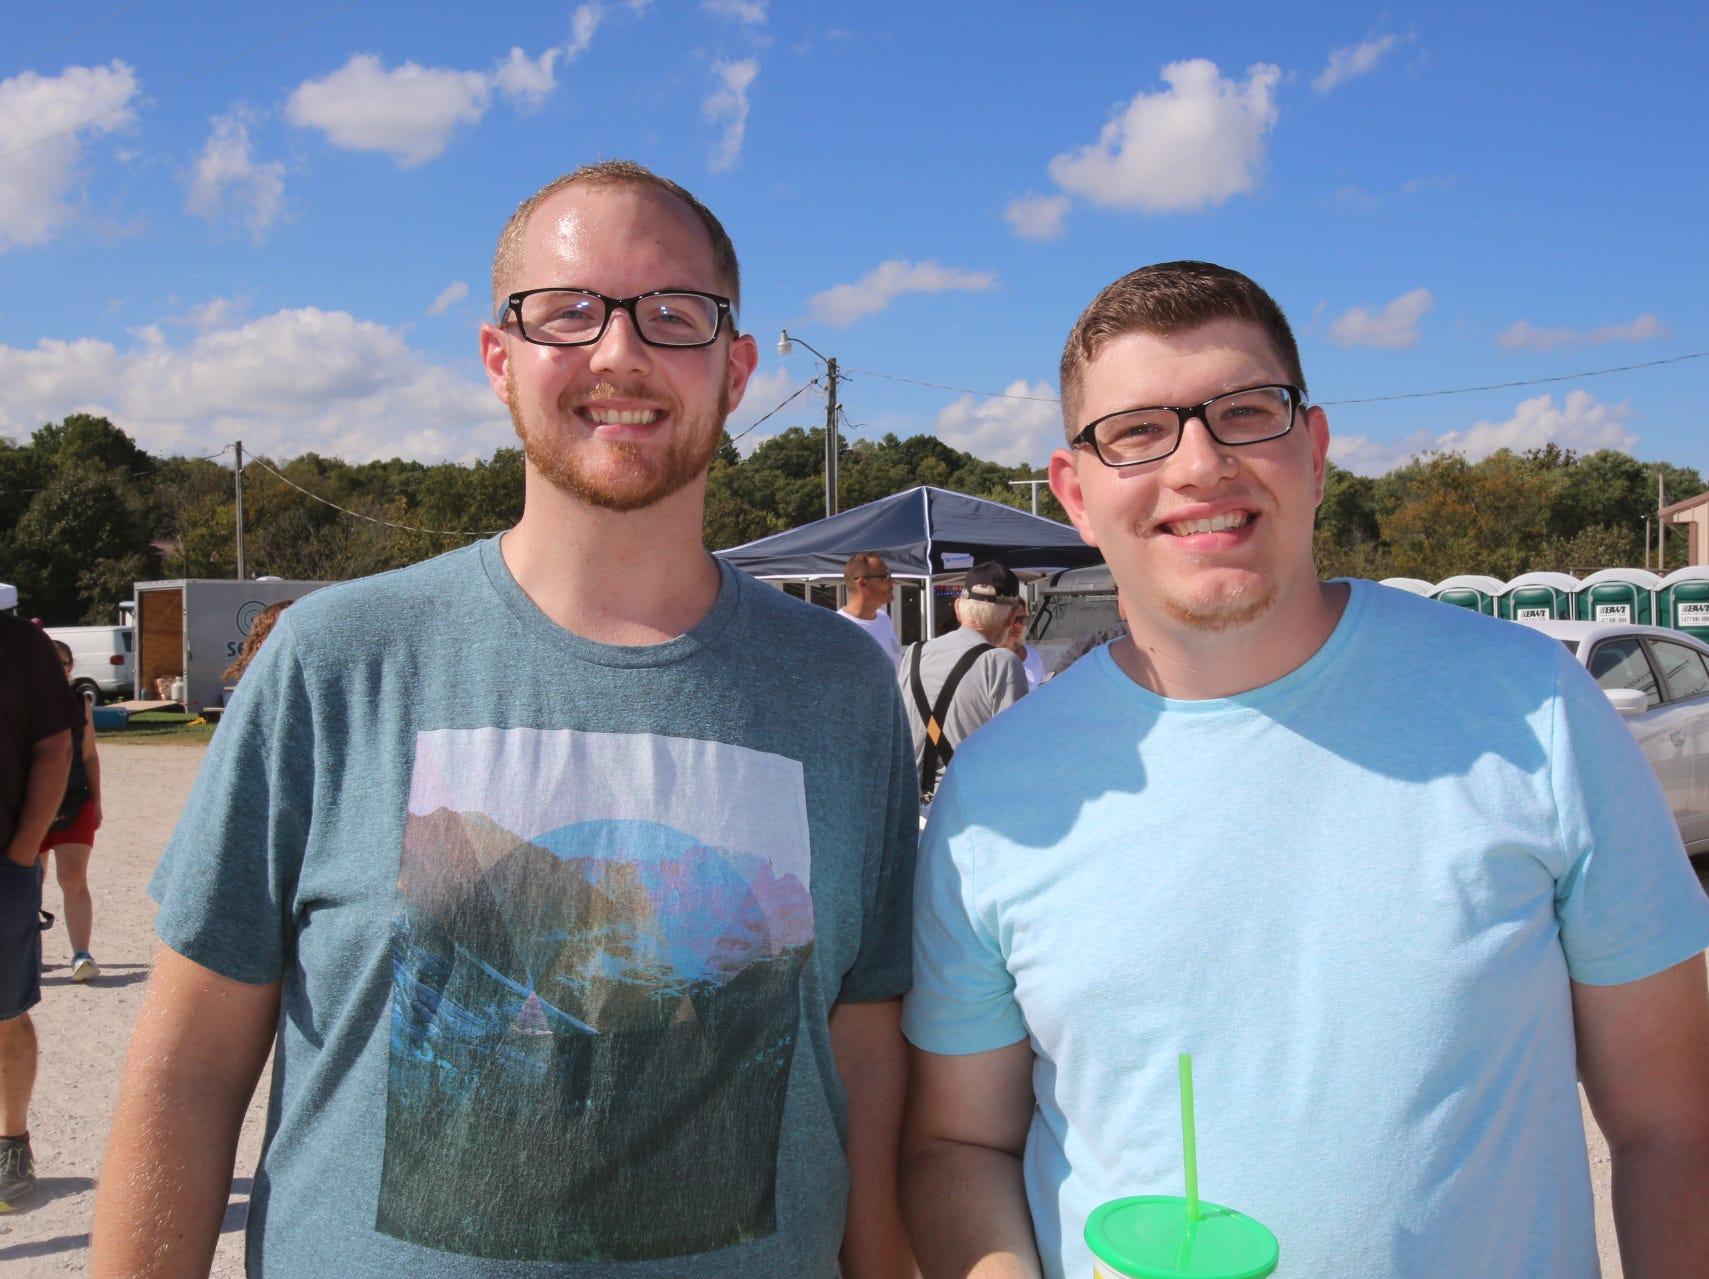 Derrik and Ethan